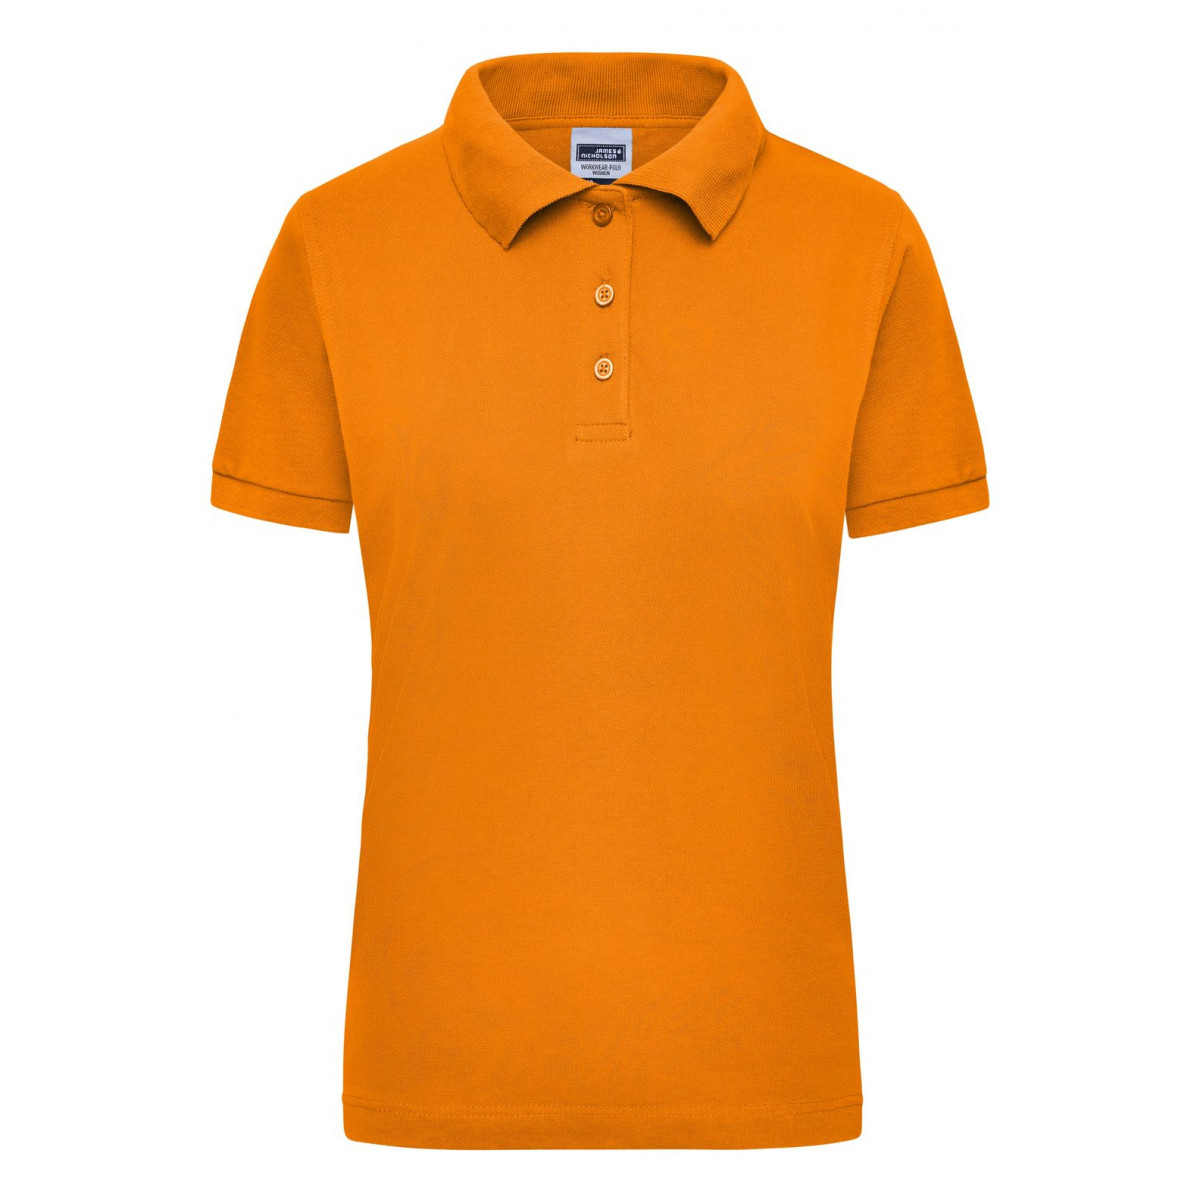 Рубашка поло мужская JN803 Workwear Polo Women - Оранжевый